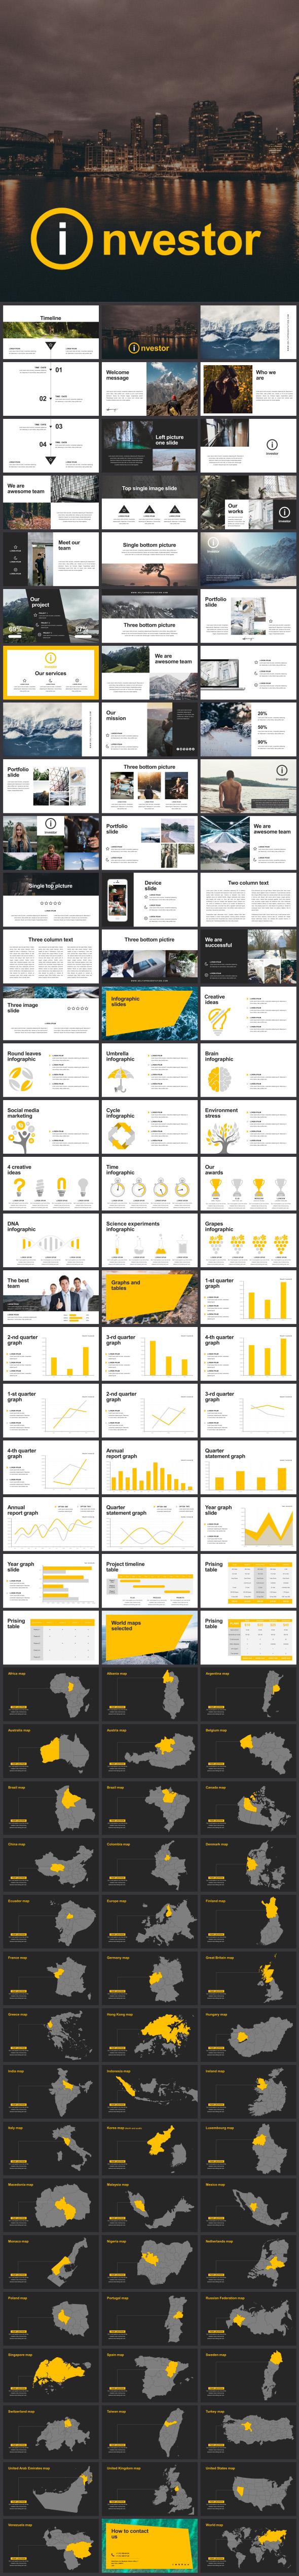 Investor Keynote Template - Business Keynote Templates